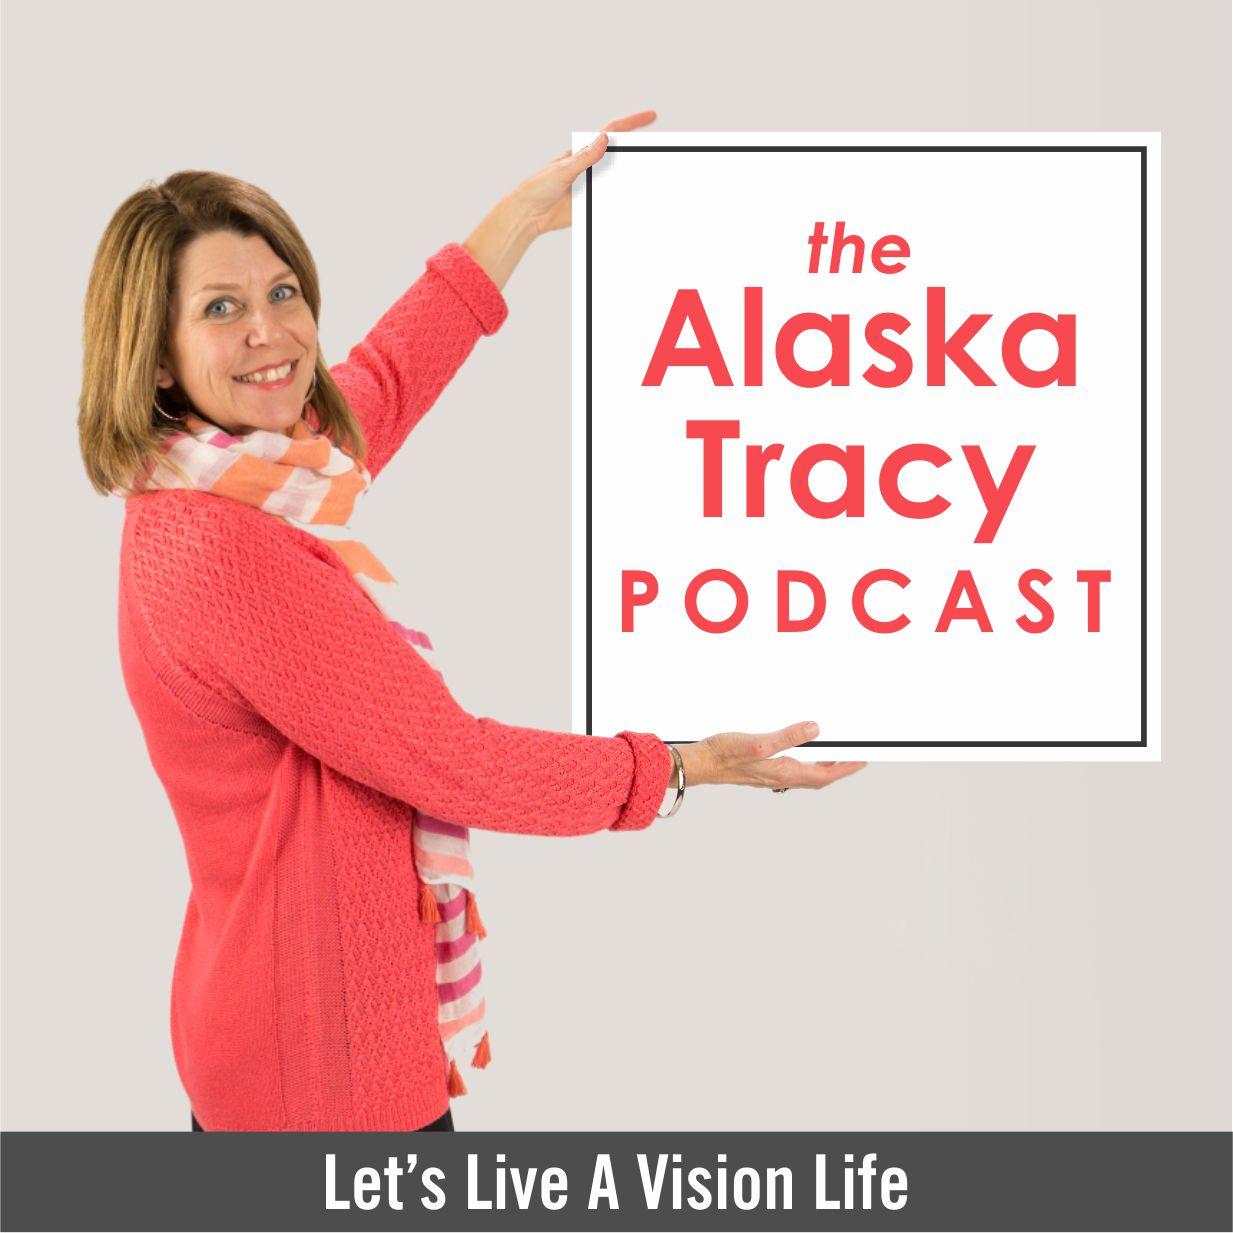 Alaska Tracy Podcast